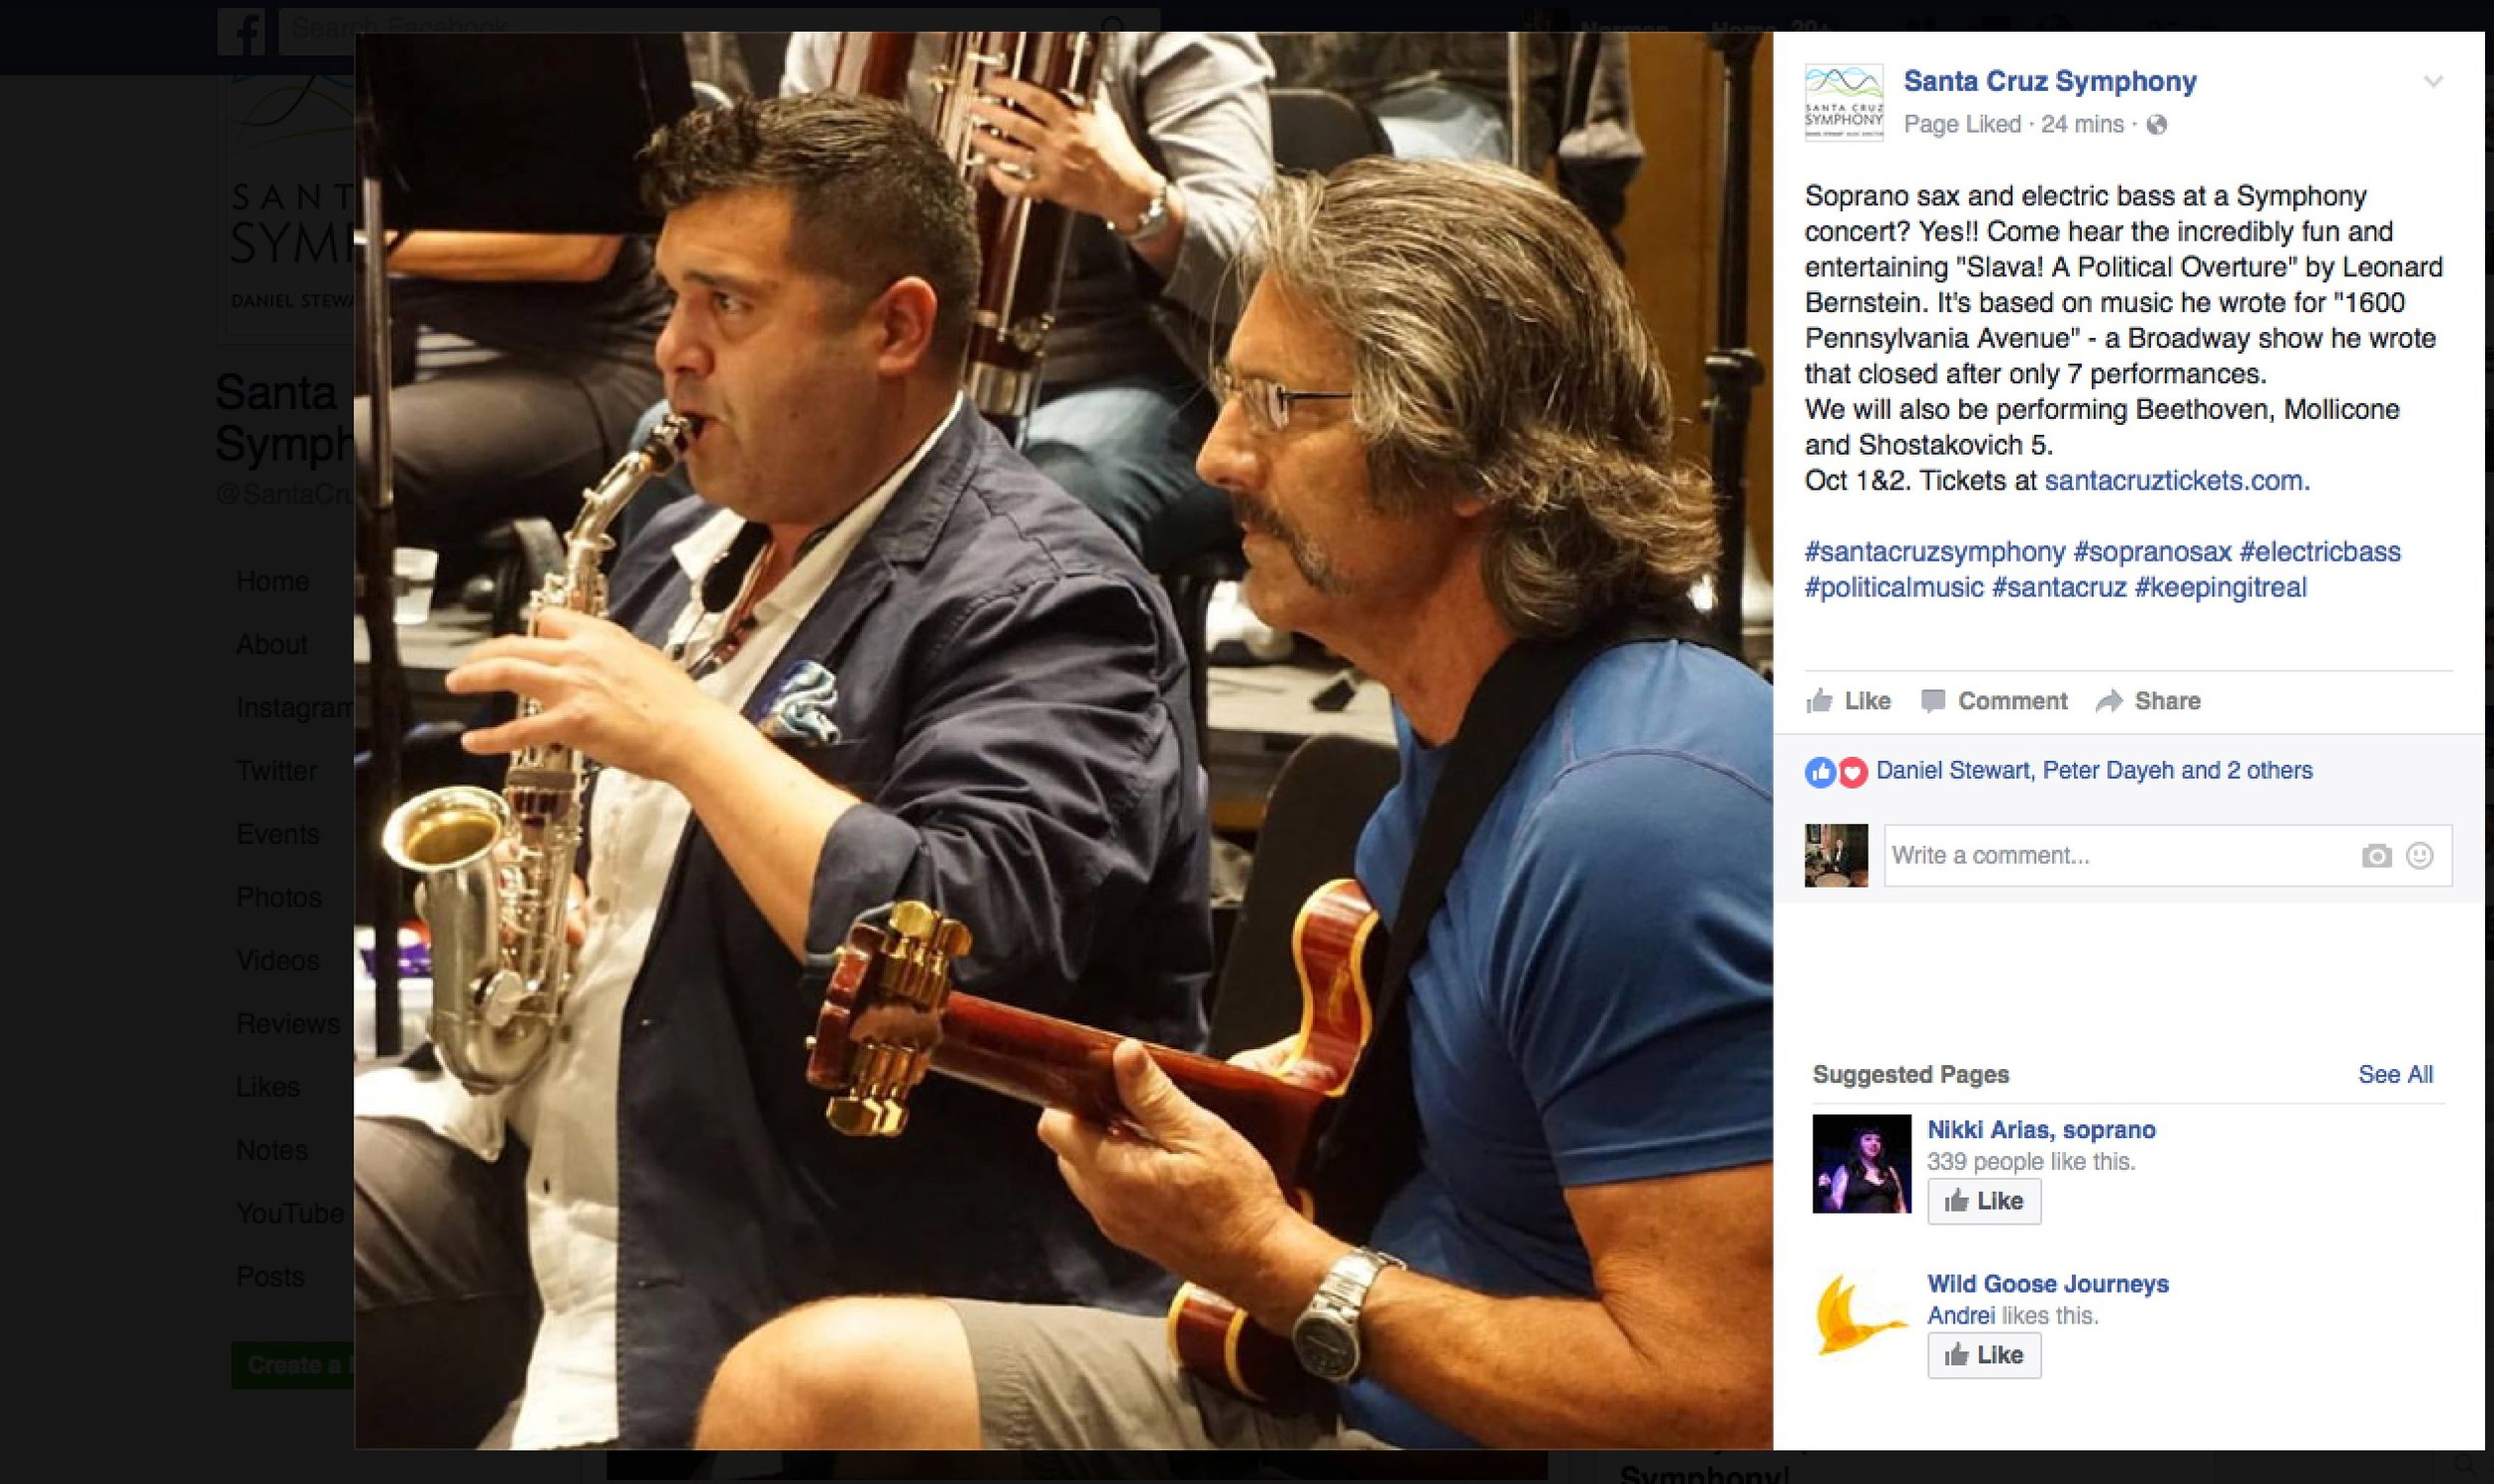 Santa Cruz Symphony, September 30, 2016, rehearsing Bernstein's SLAVA. And no; that's NOT an electric bass! It's a Gibson 335.